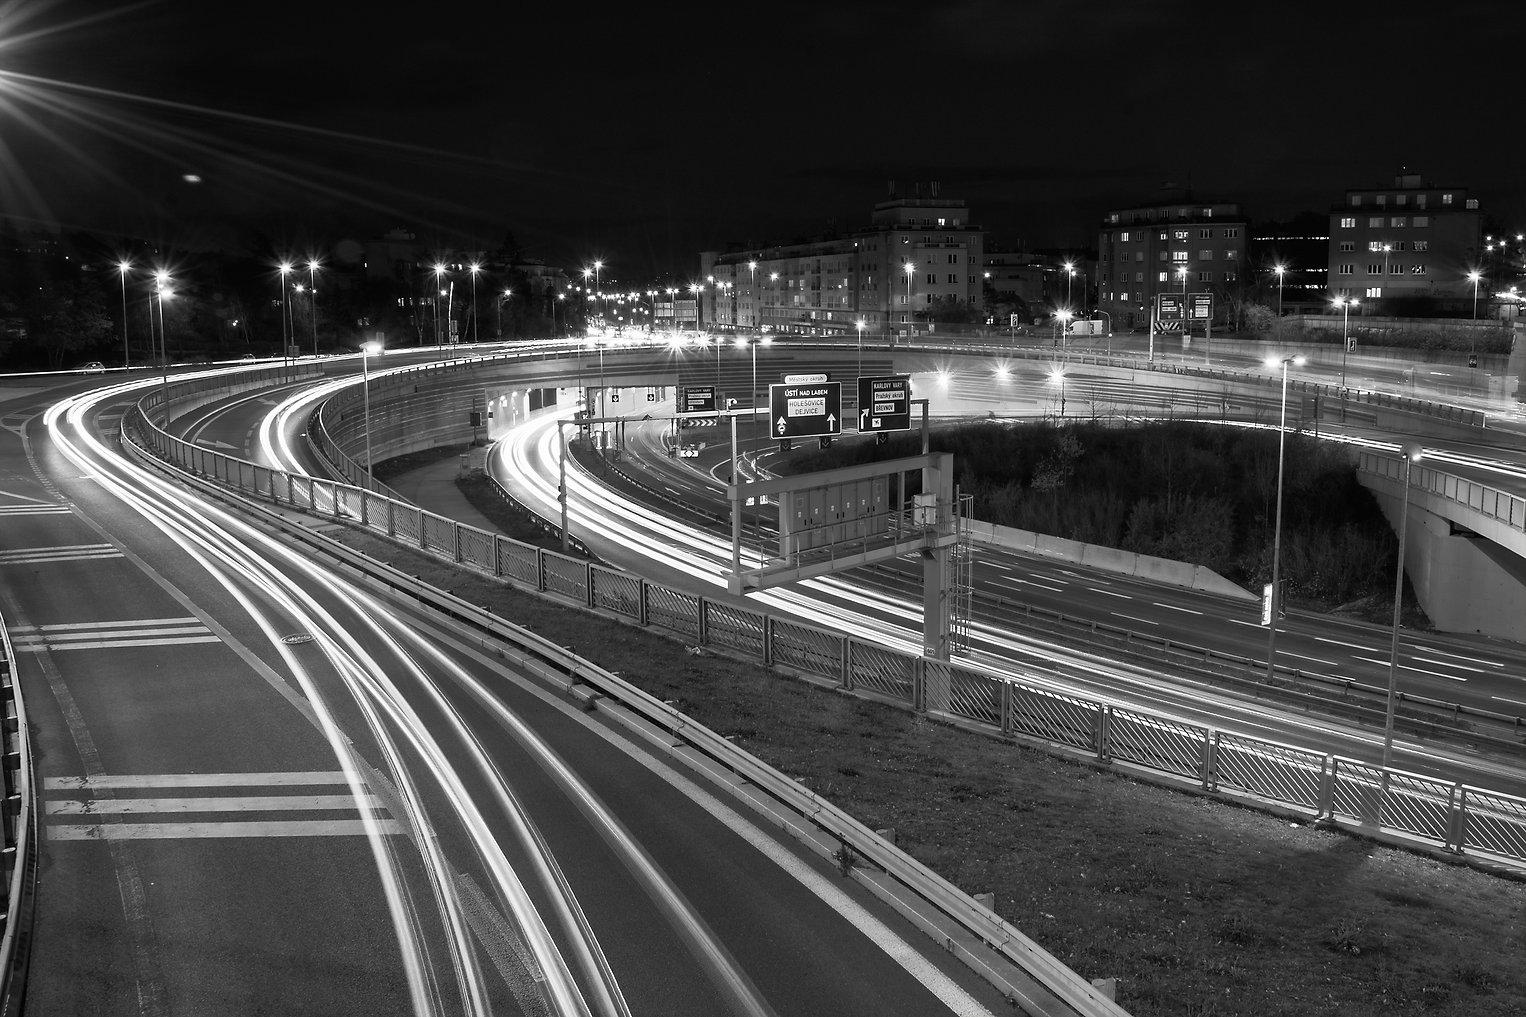 street-car-lights.jpg